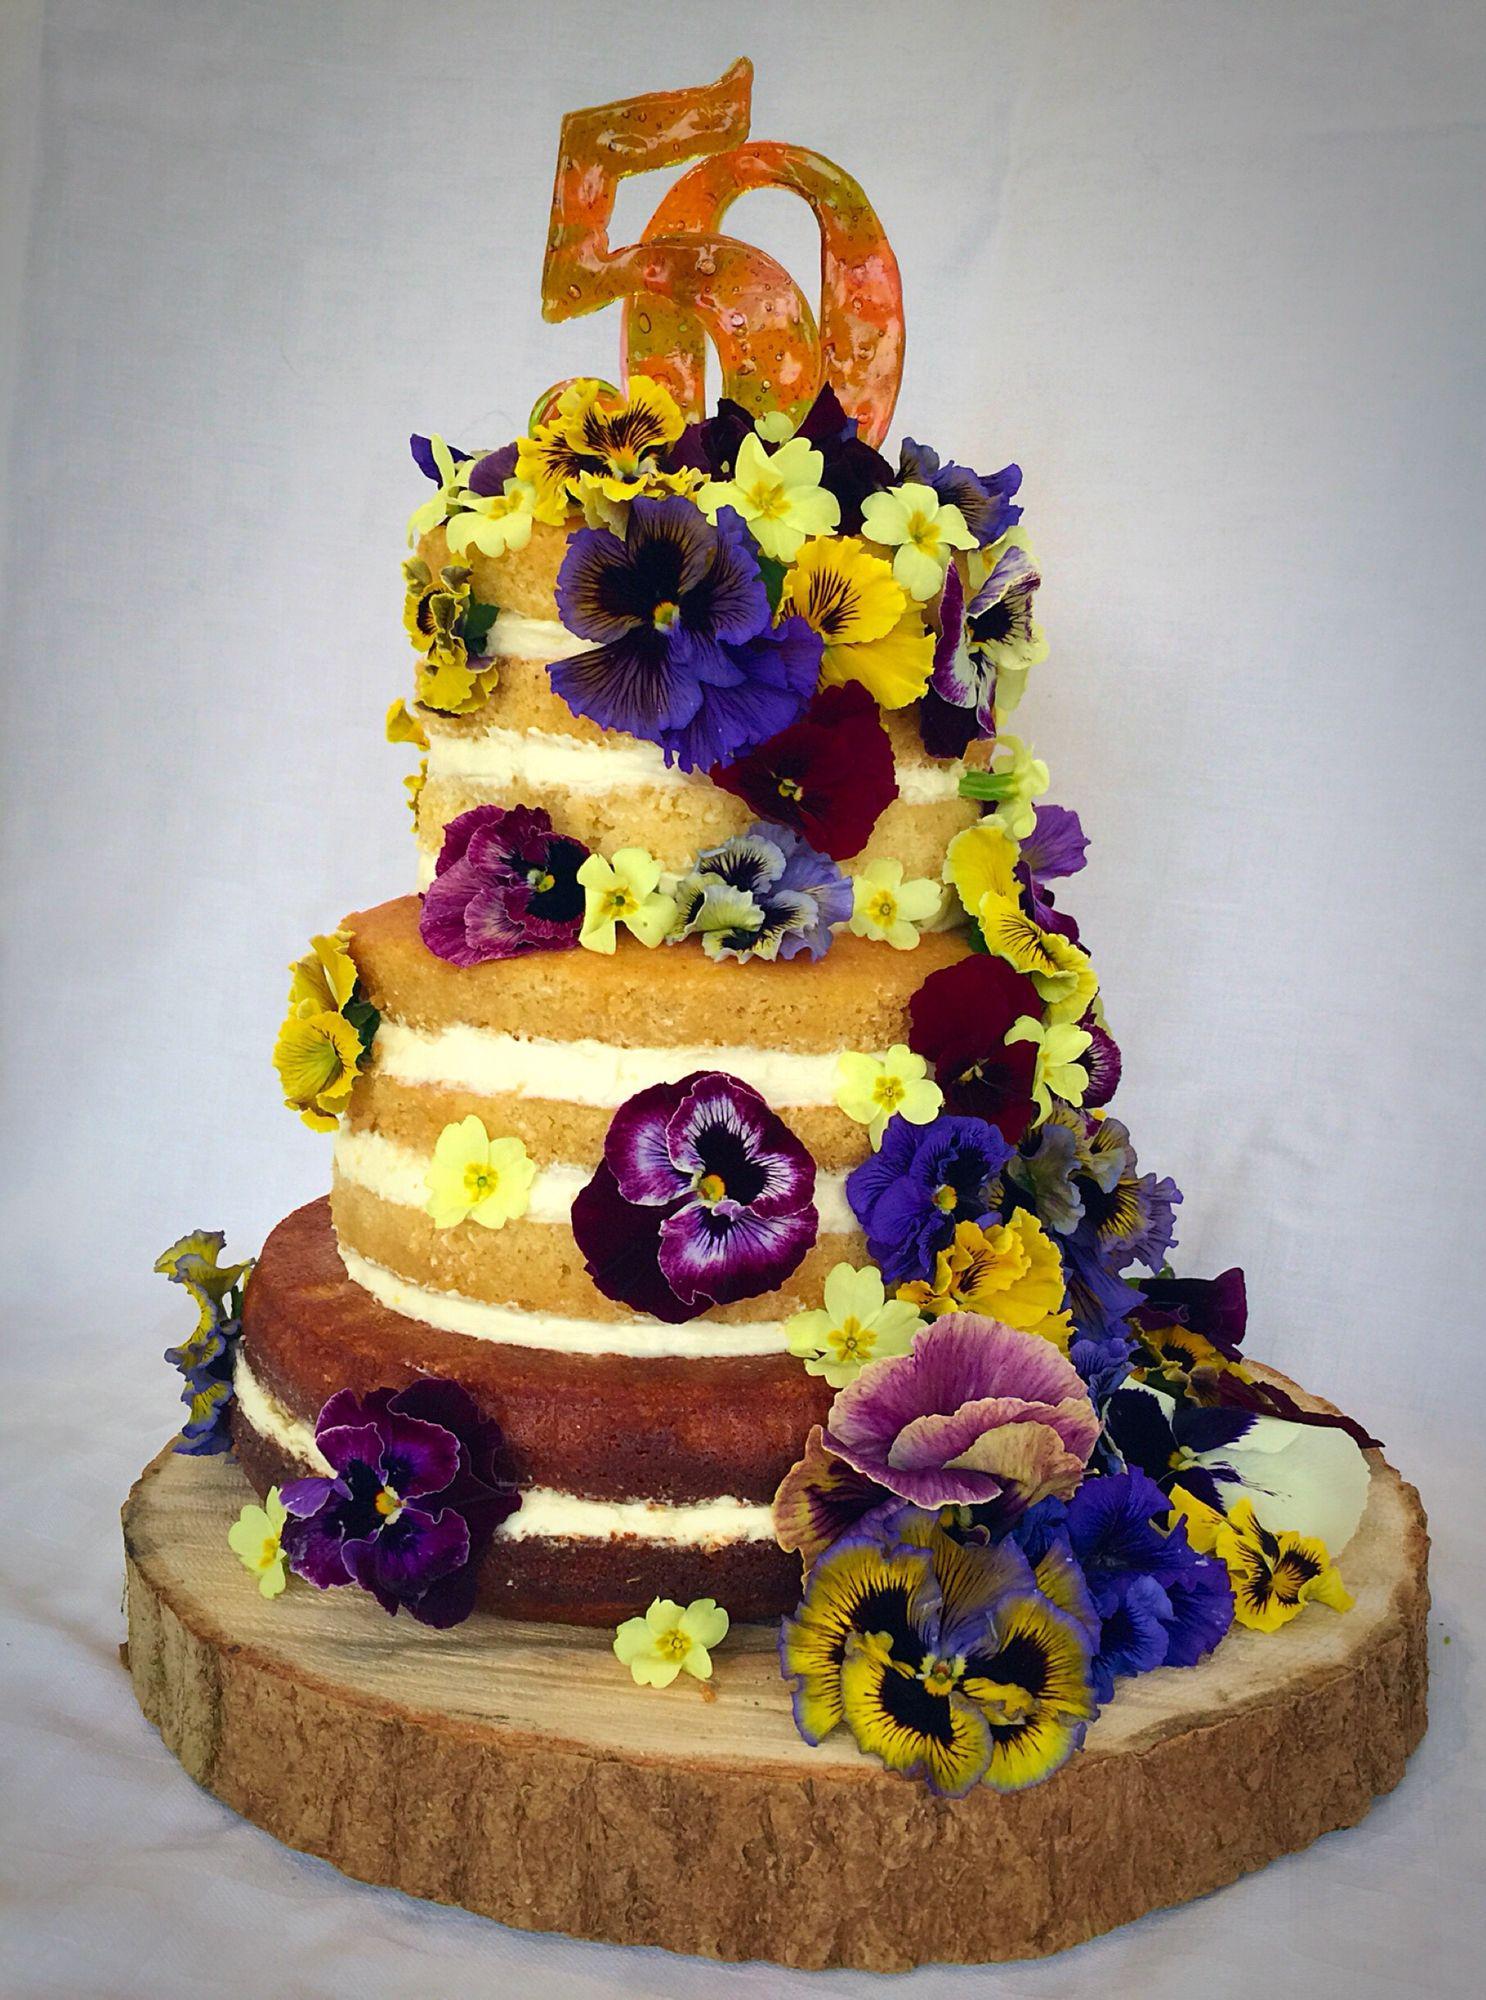 Cake · Naked Lemon Cake With Fresh Edible Flowers